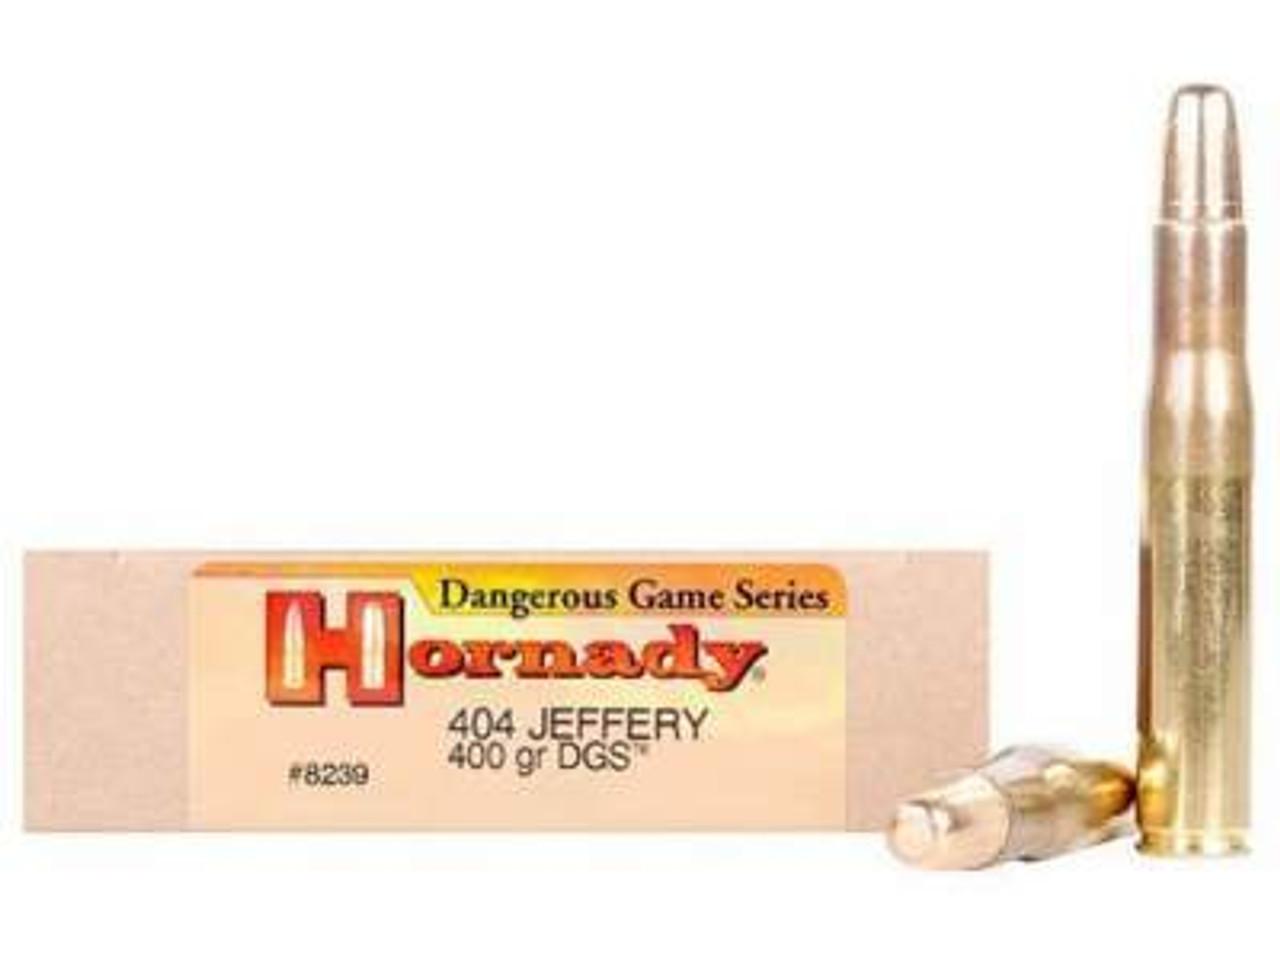 404 Jeffery Ammo